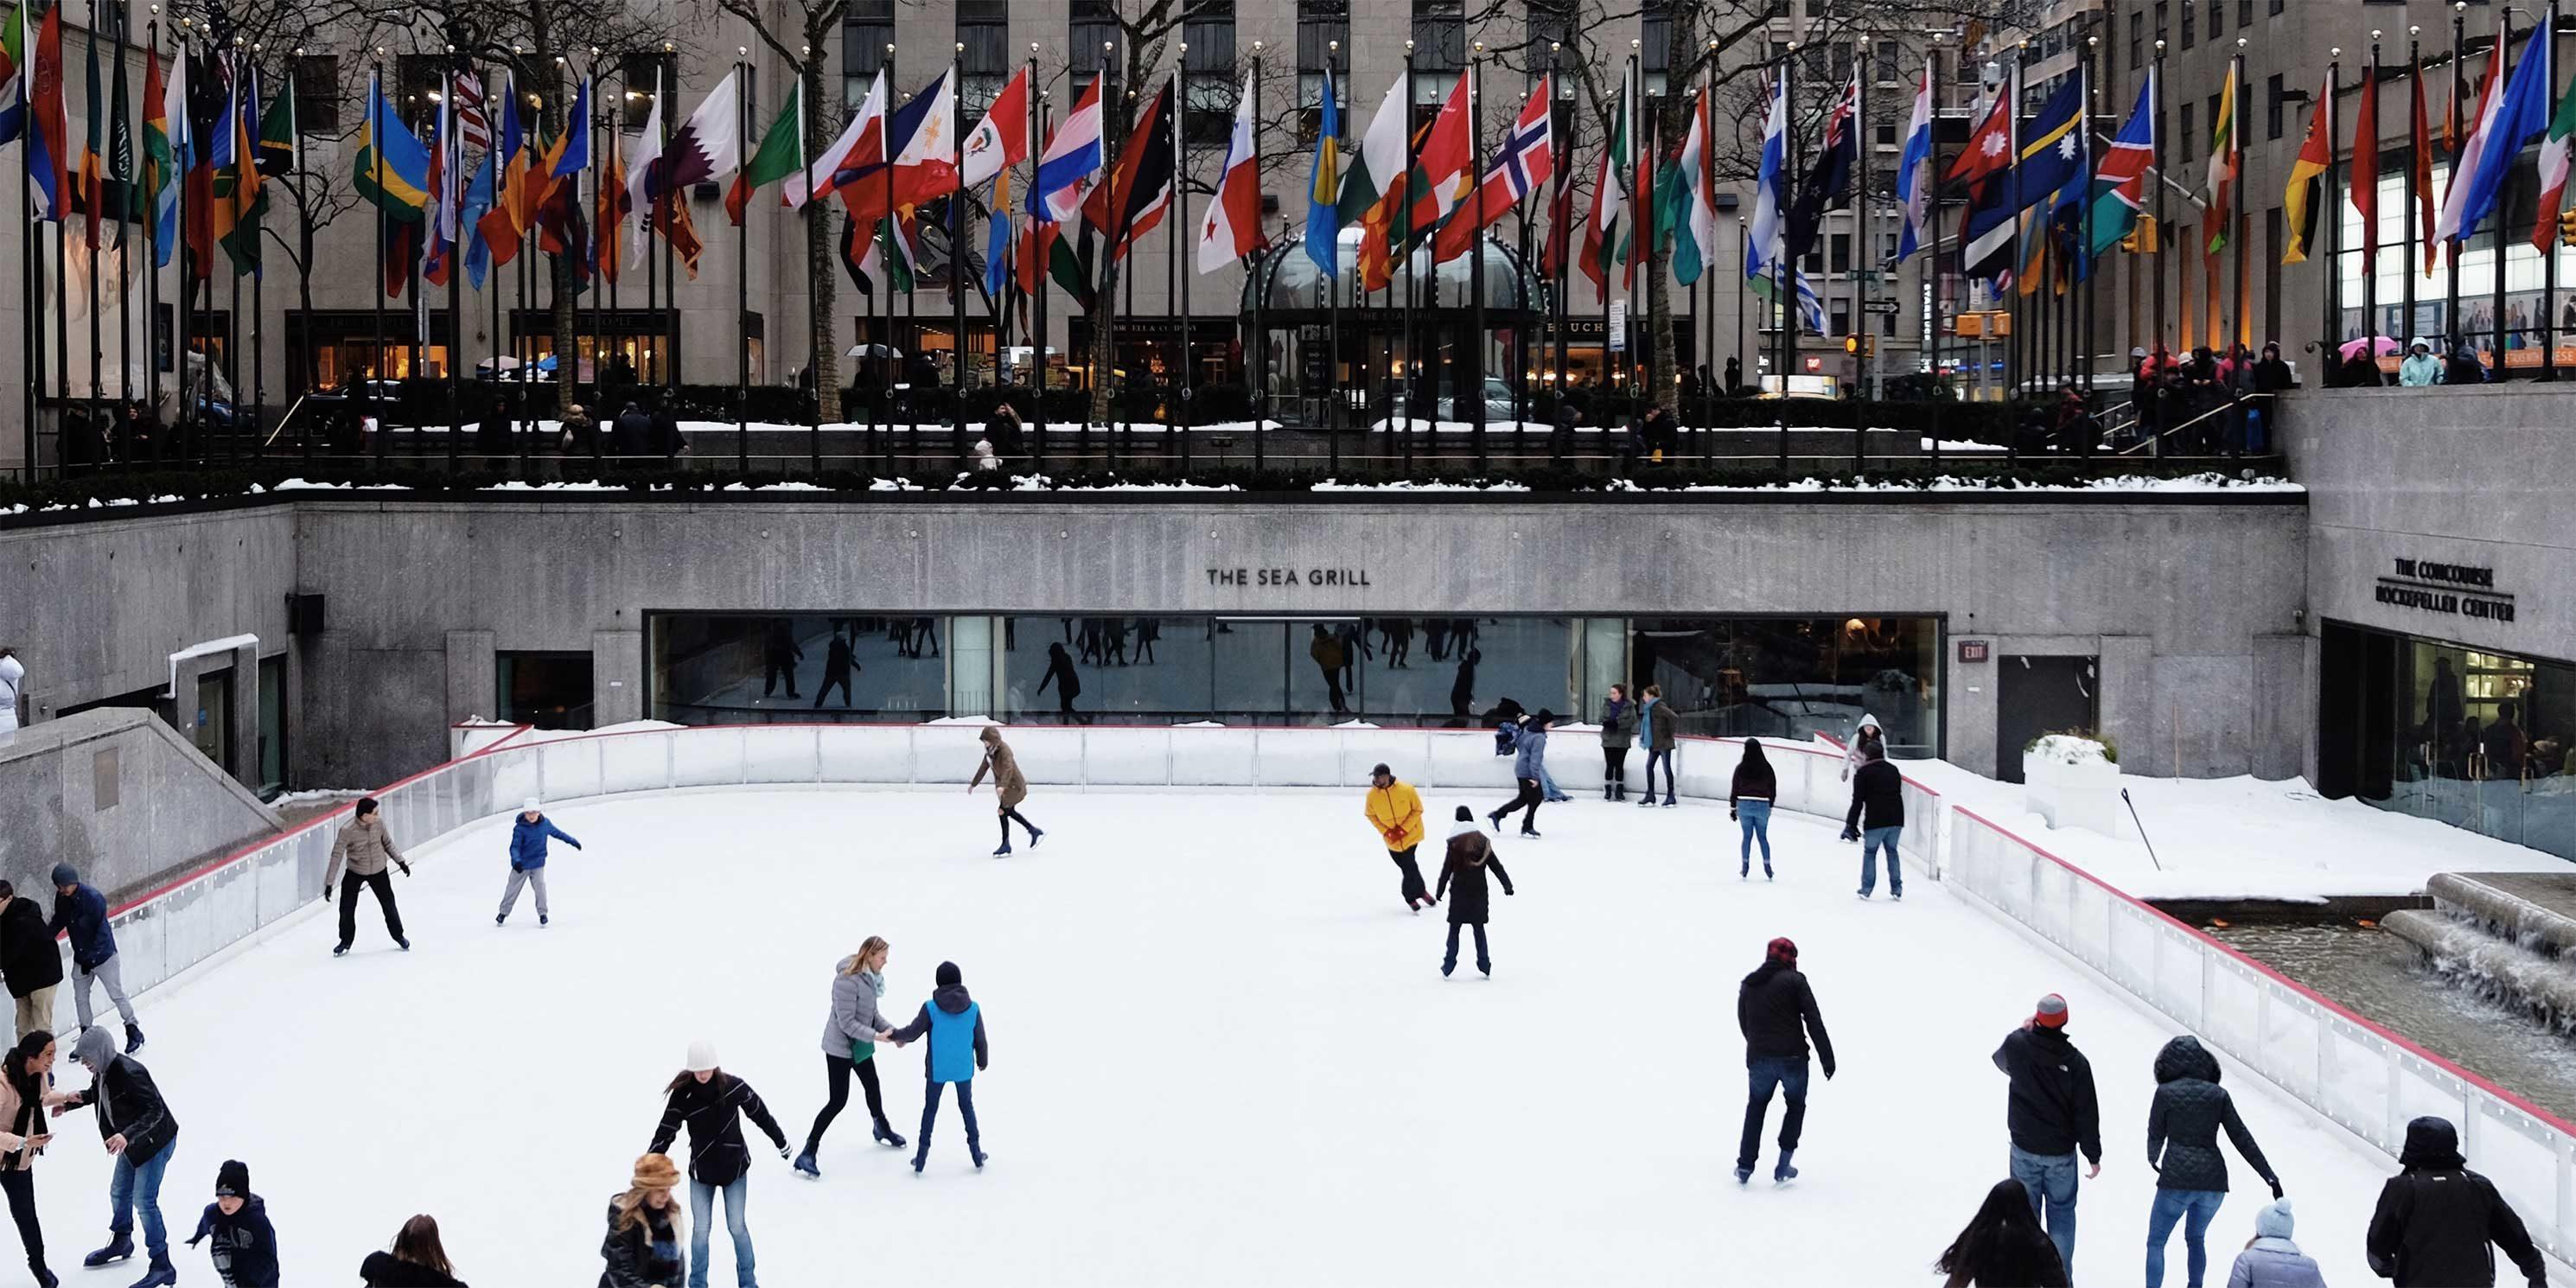 skaters at the ice rink in Rockefeller Center